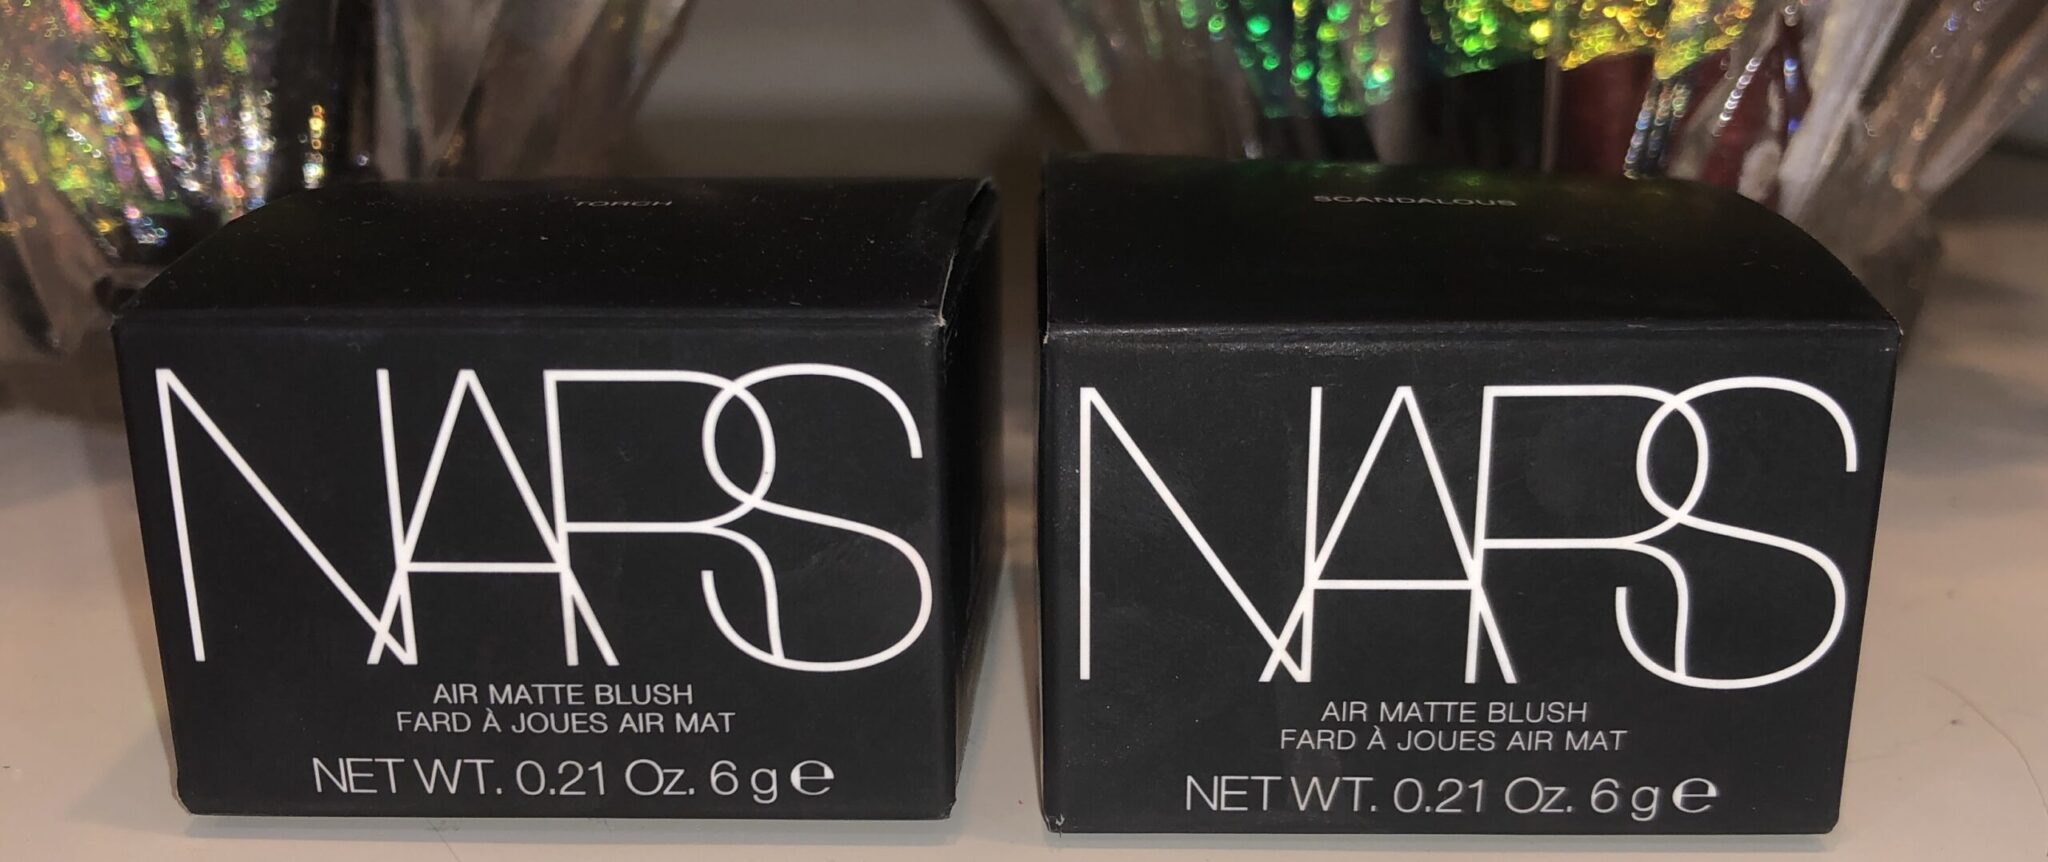 Nars Air Matte Blush outer boxes